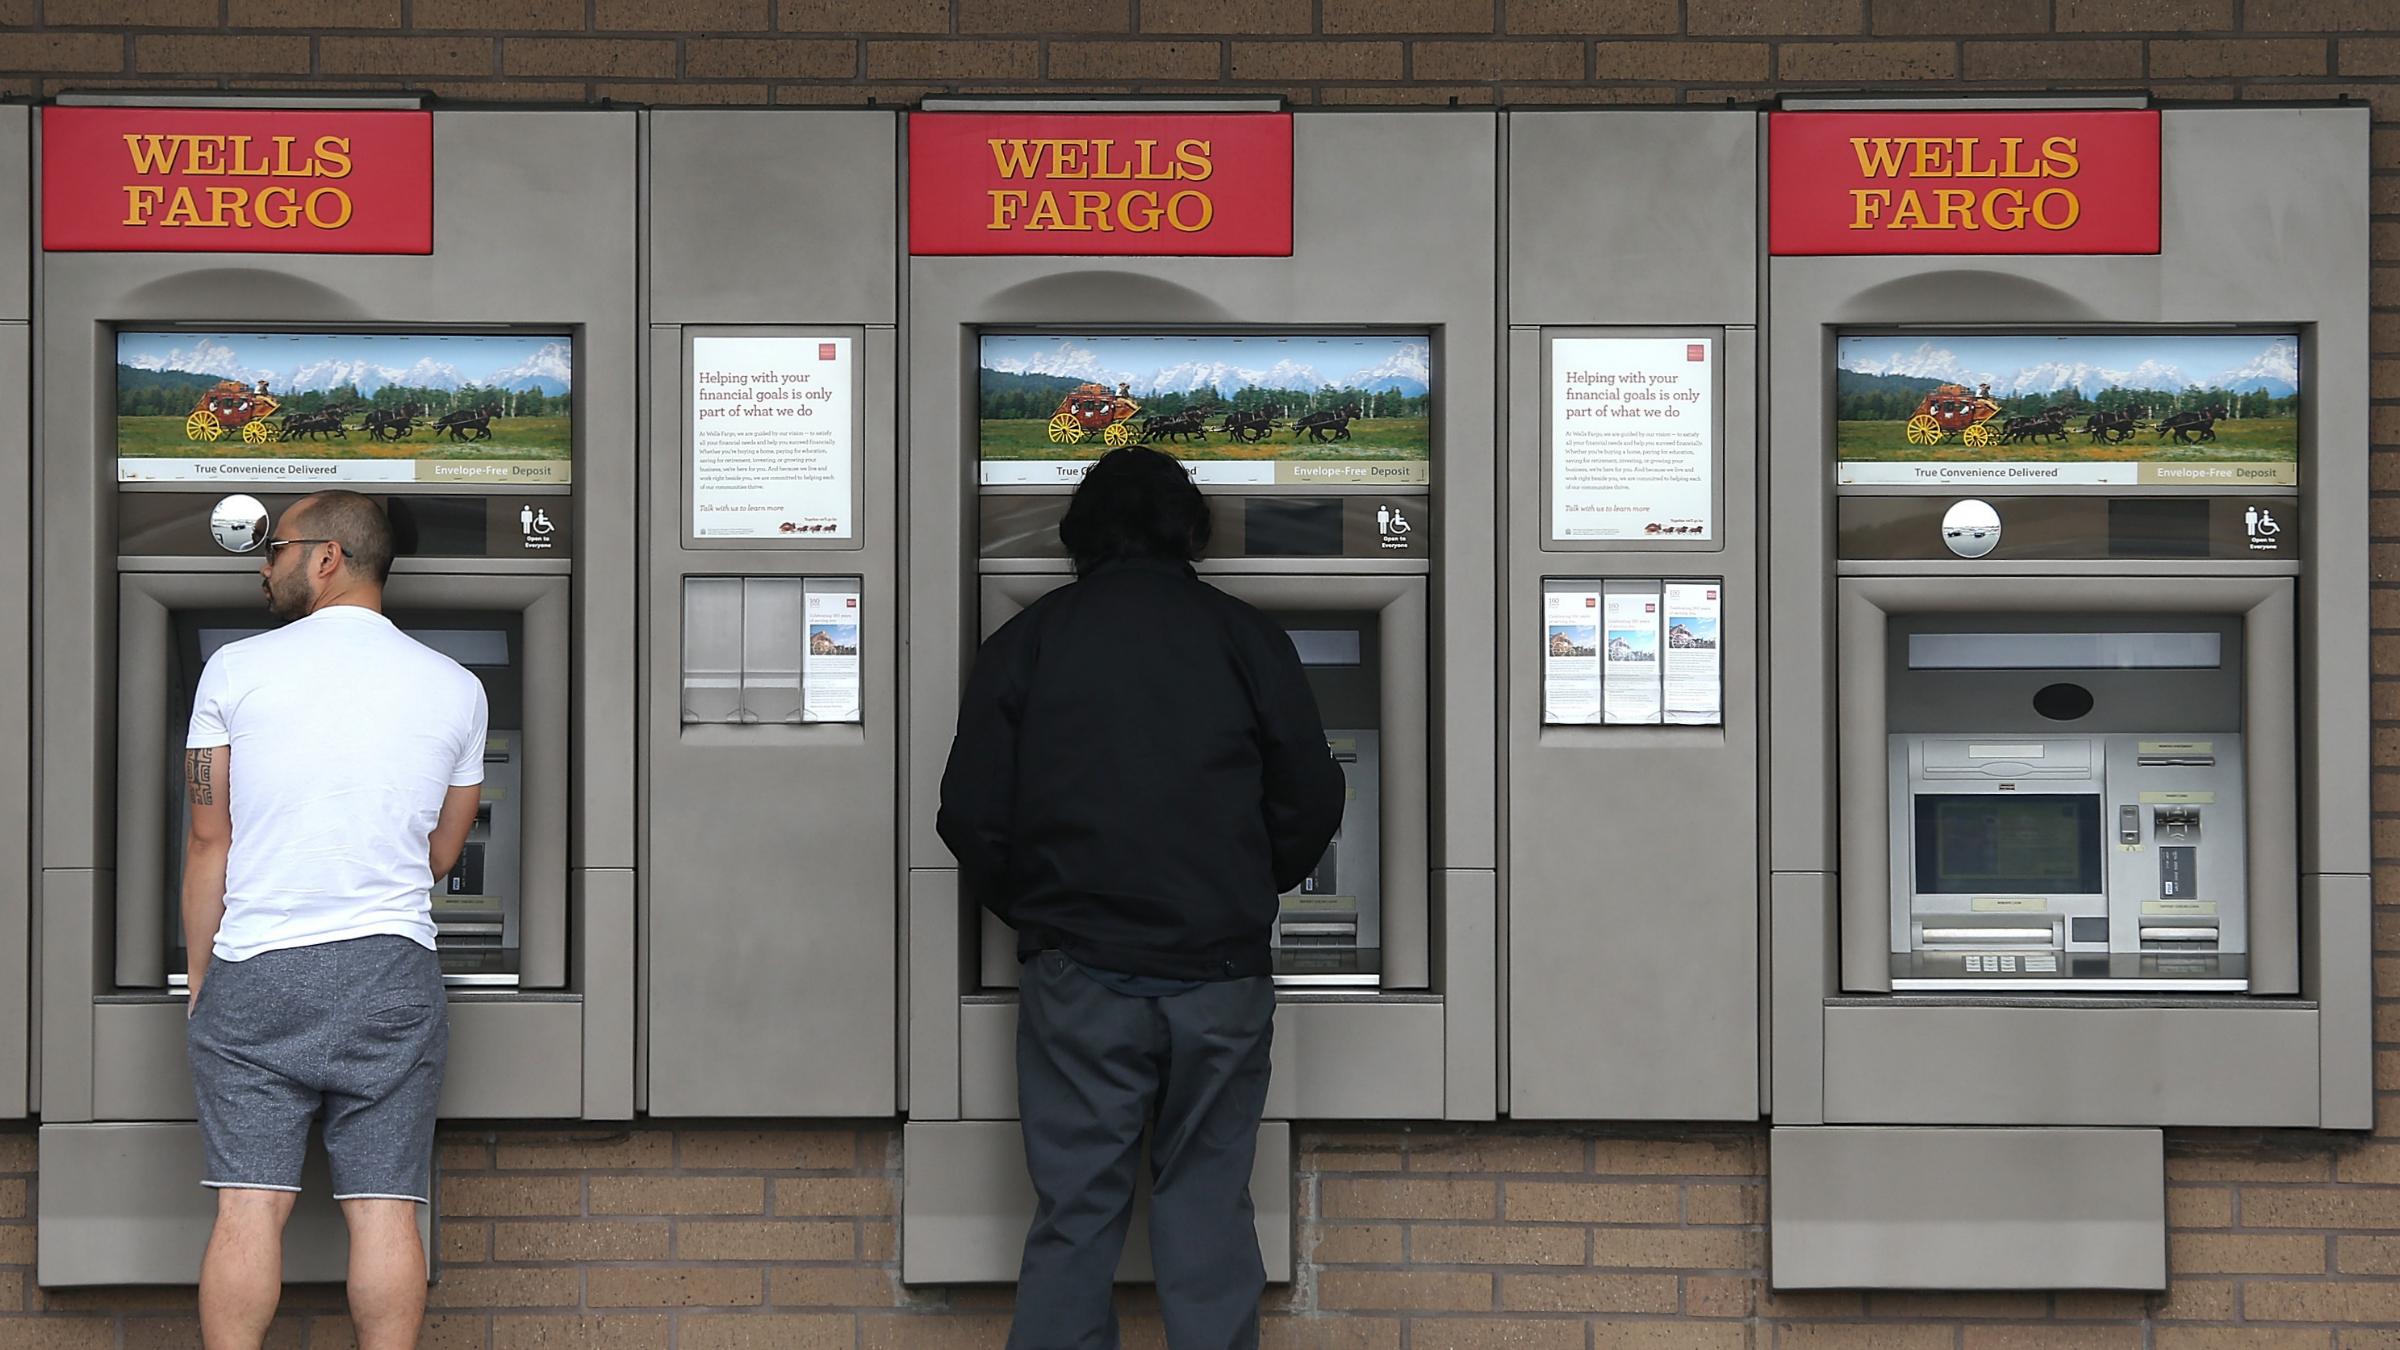 Wells Fargo ATM machines